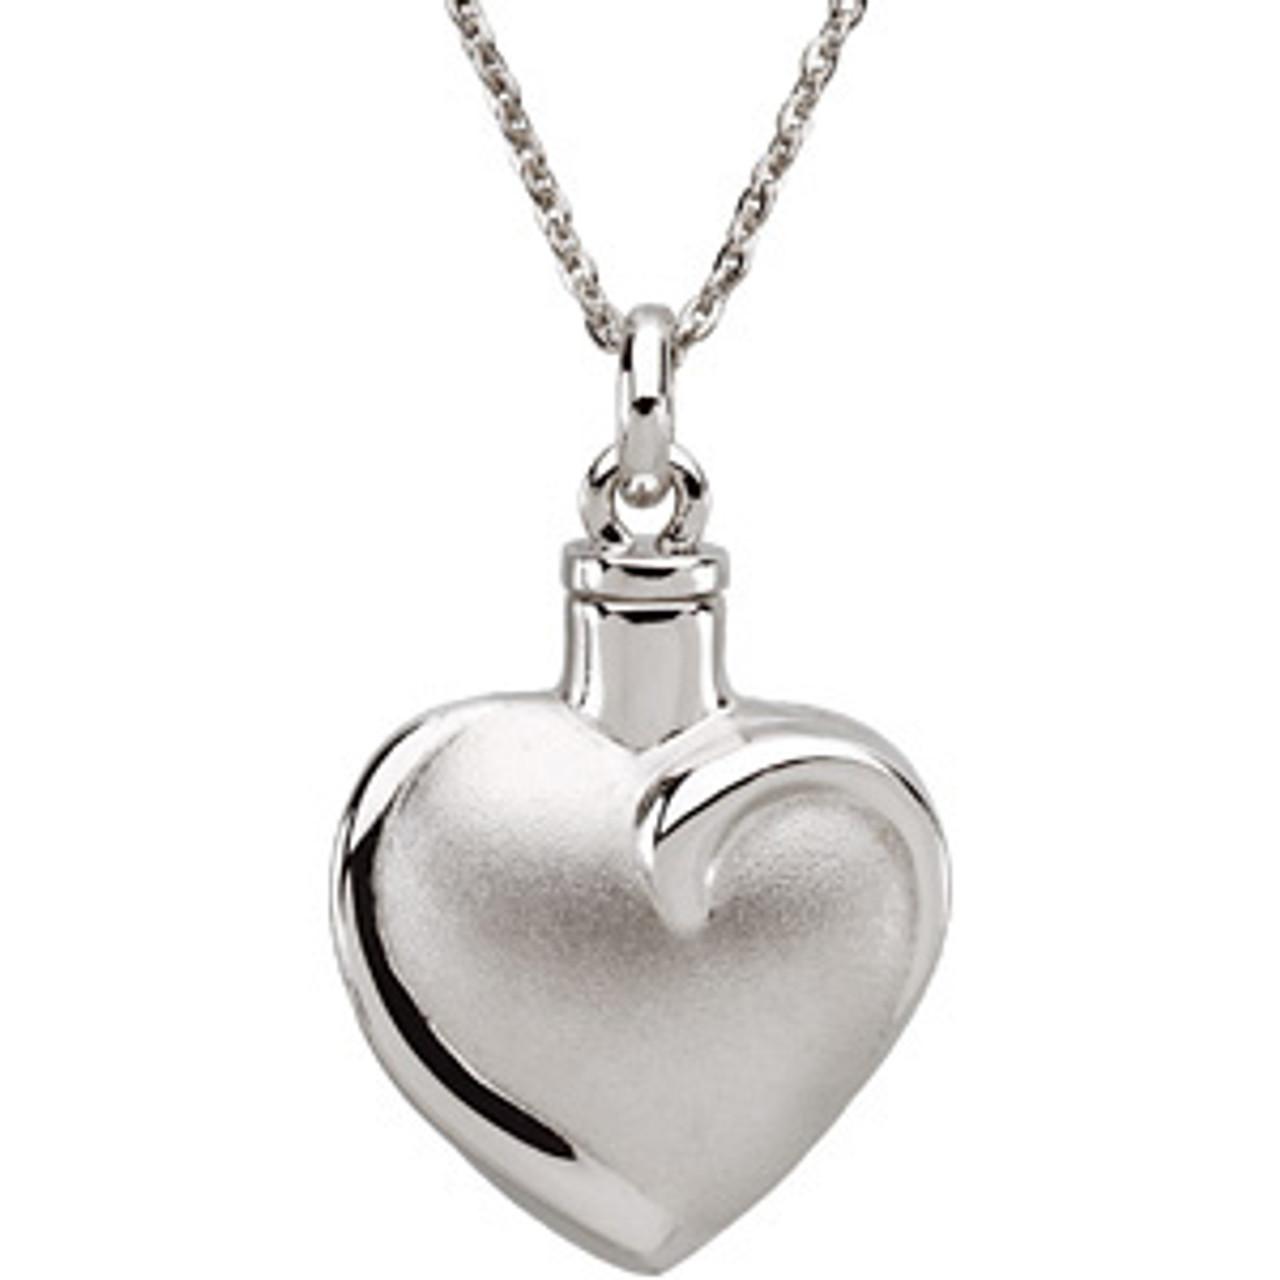 Fancy Heart™ Ash Pendant 26.46mm x 19.56mm 10.00 grams 6.43 DWT